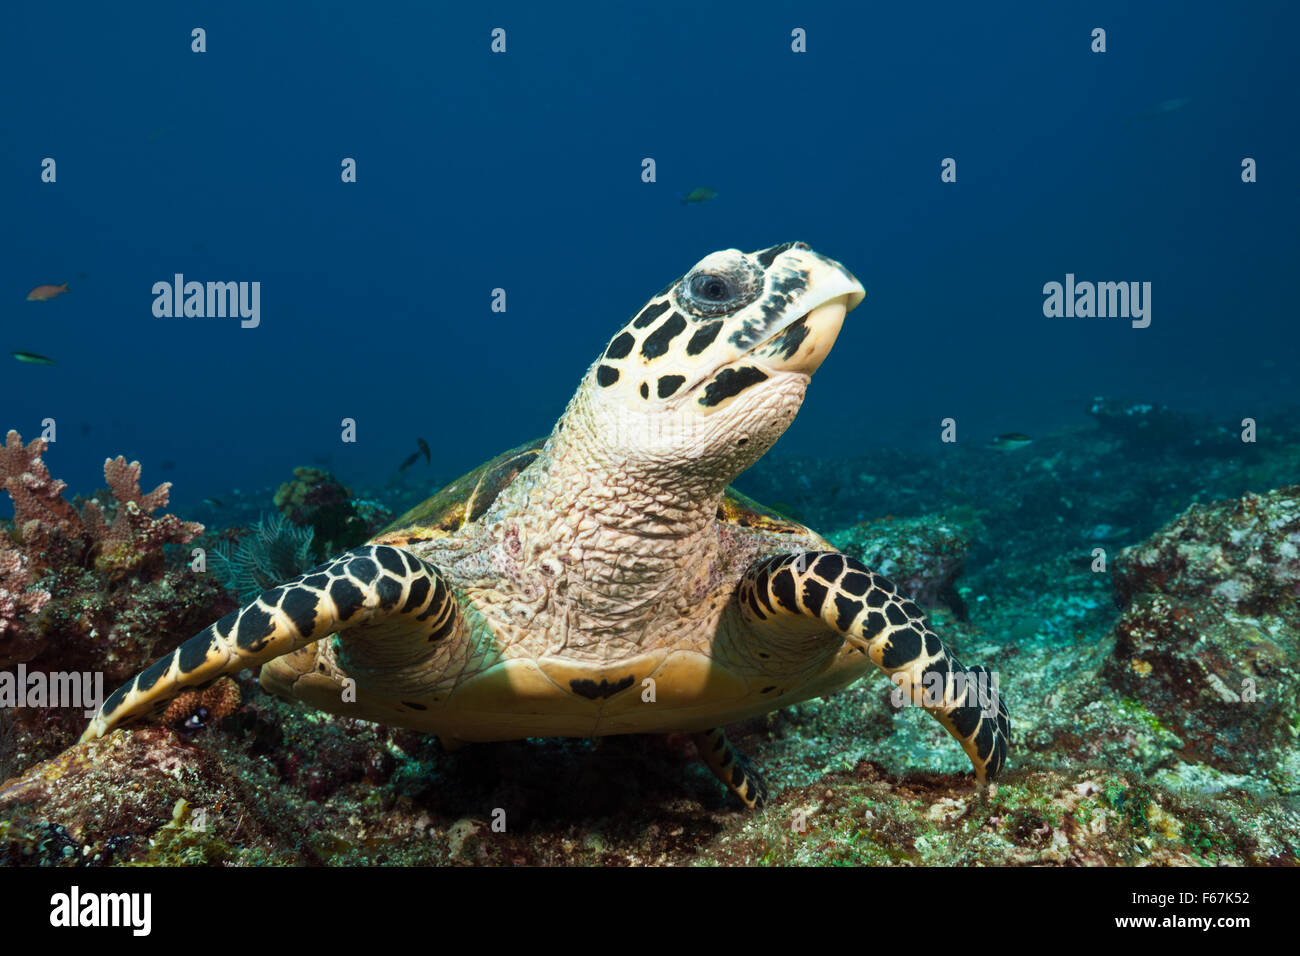 Tortuga carey, Eretmochelys imbricata, el Parque Nacional de Komodo (Indonesia) Imagen De Stock